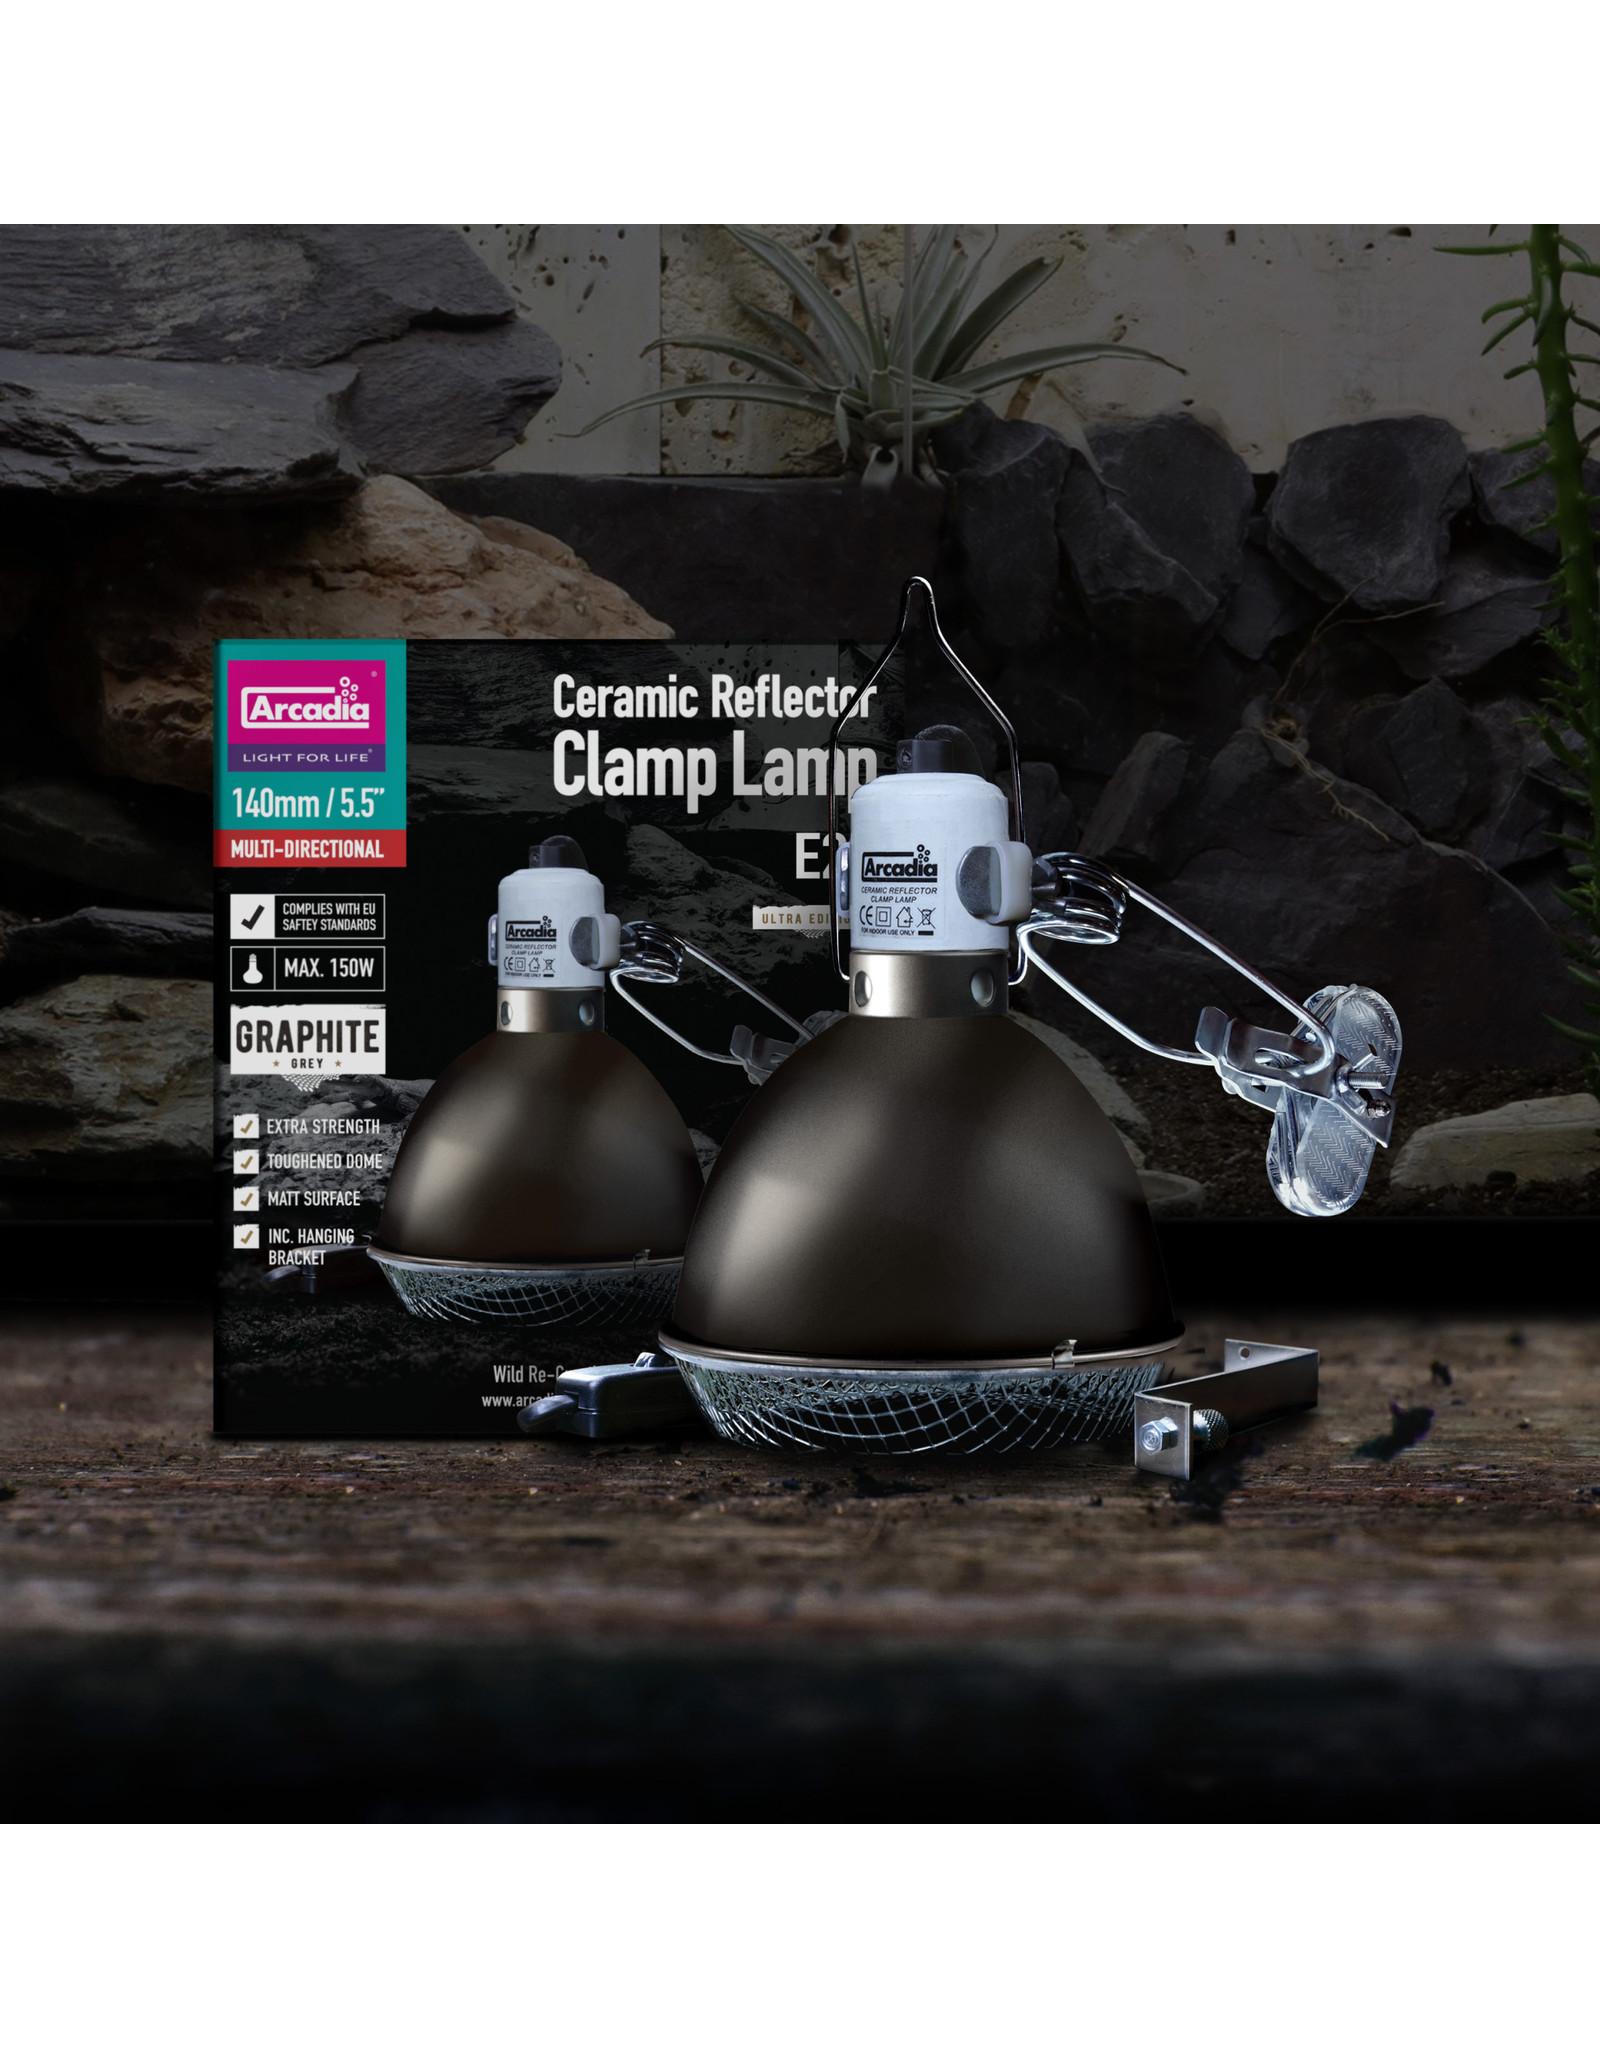 Arcadia AR Ceramic Reflector Clamp Lamp Small Graphite